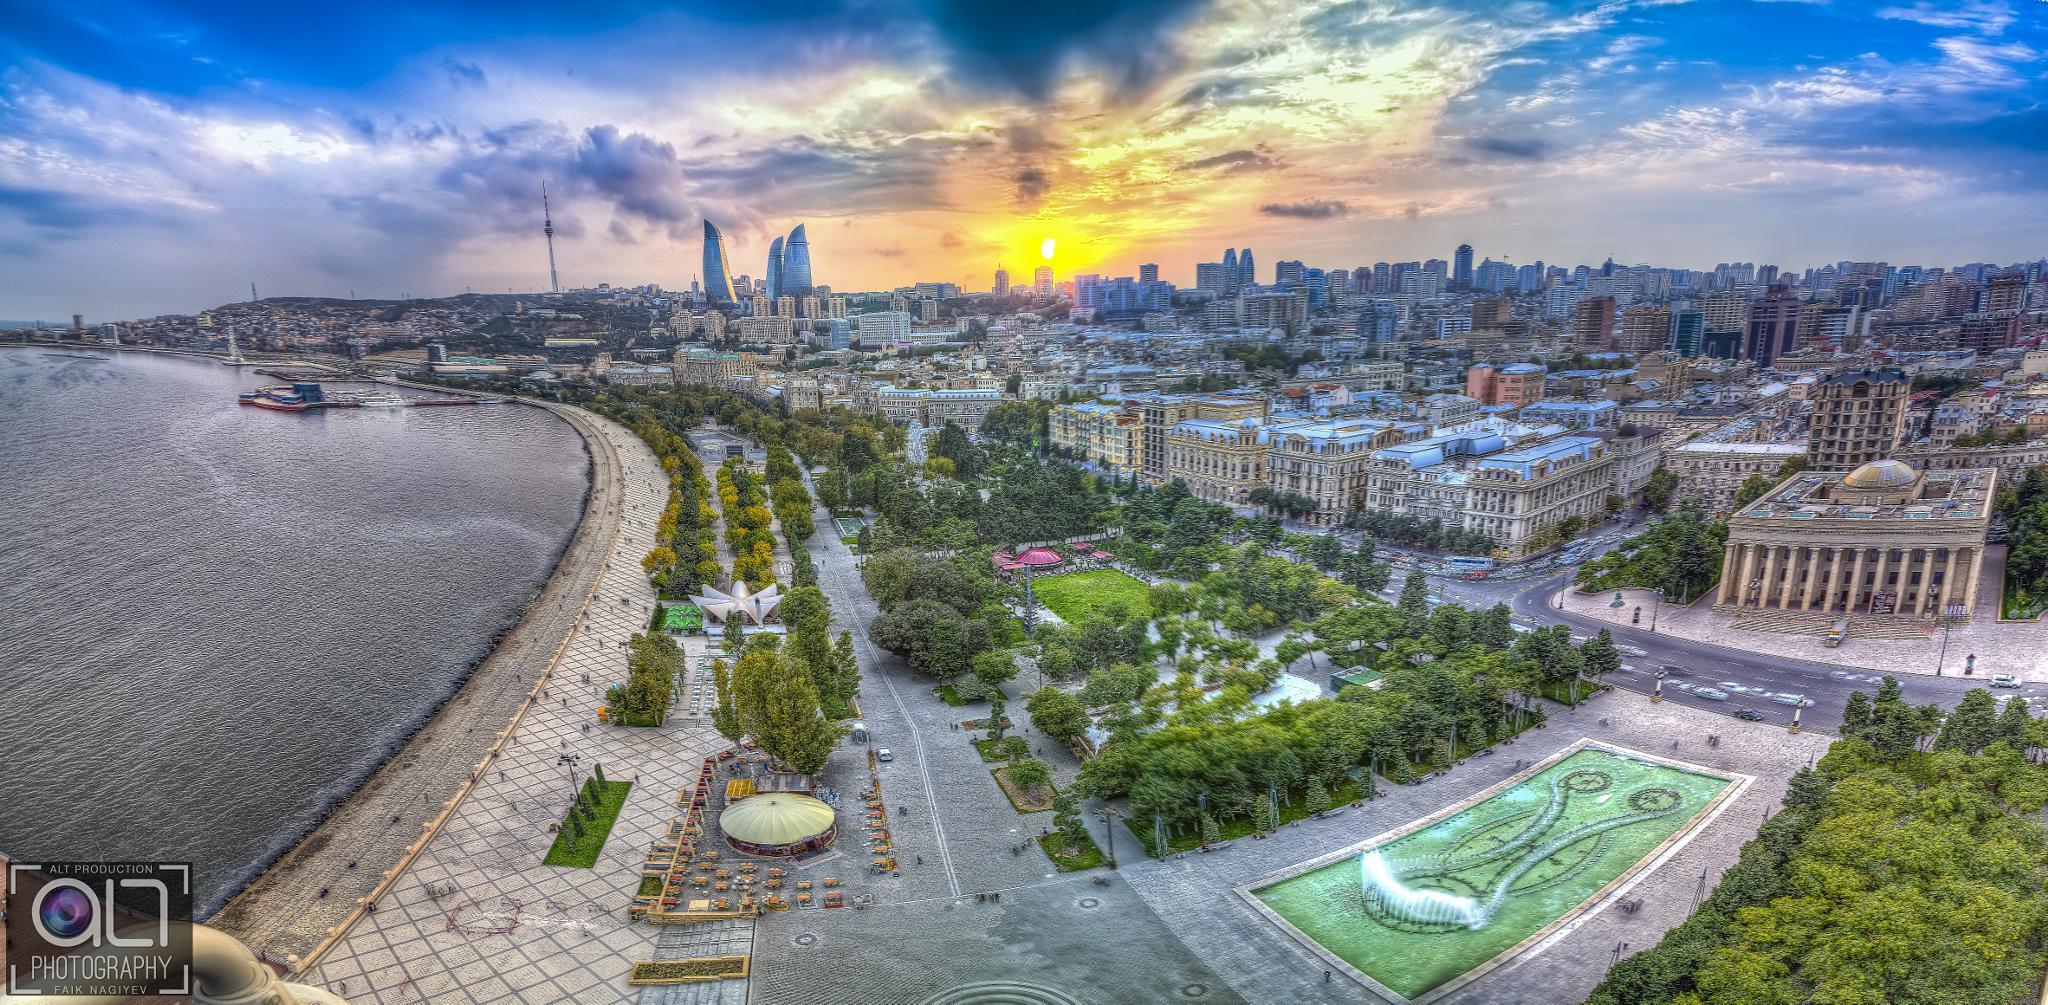 Roof view by Faik Nagiyev